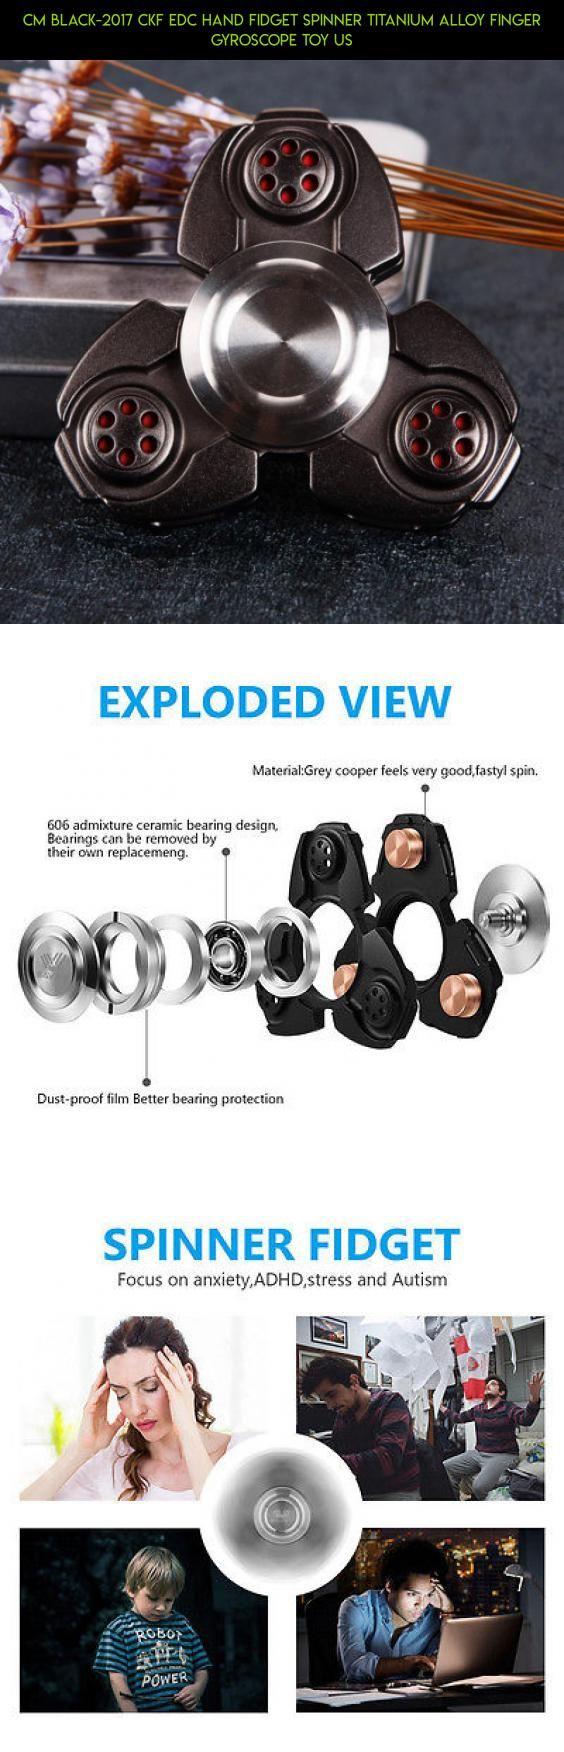 Agapeon Fidget Spinner High Speed Tri Toy Stress Besi Robot Premium Quality Cm Black 2017 Ckf Edc Hand Titanium Alloy Finger Gyroscope Us